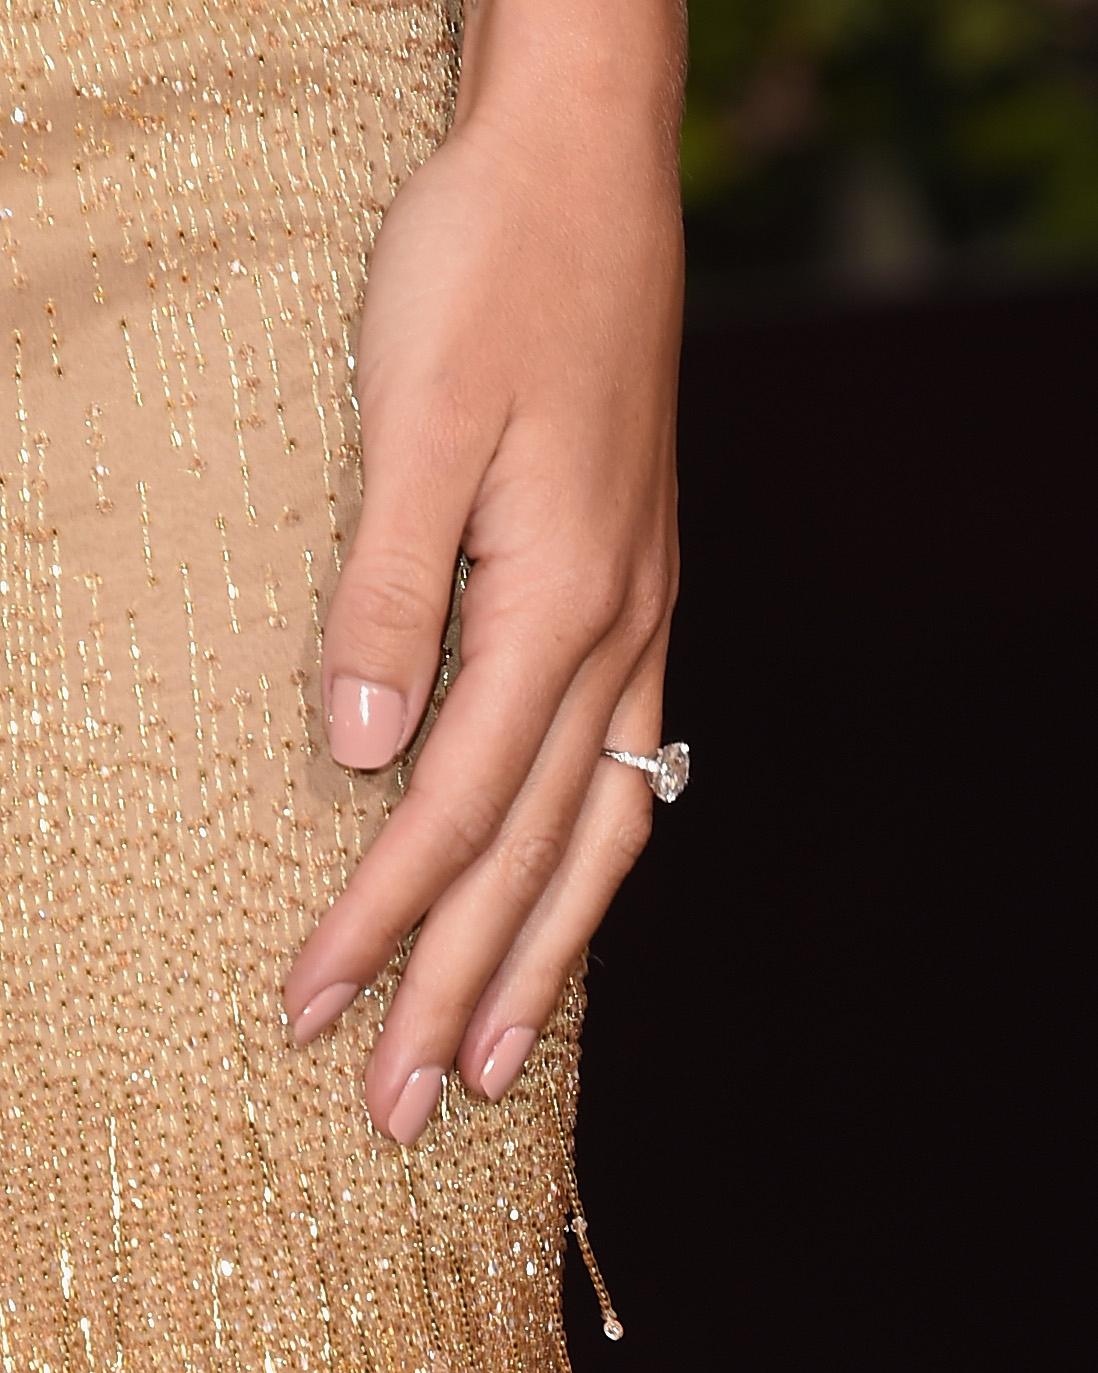 celebrity-engagement-ring-rosie-huntington-whiteley-0116.jpg